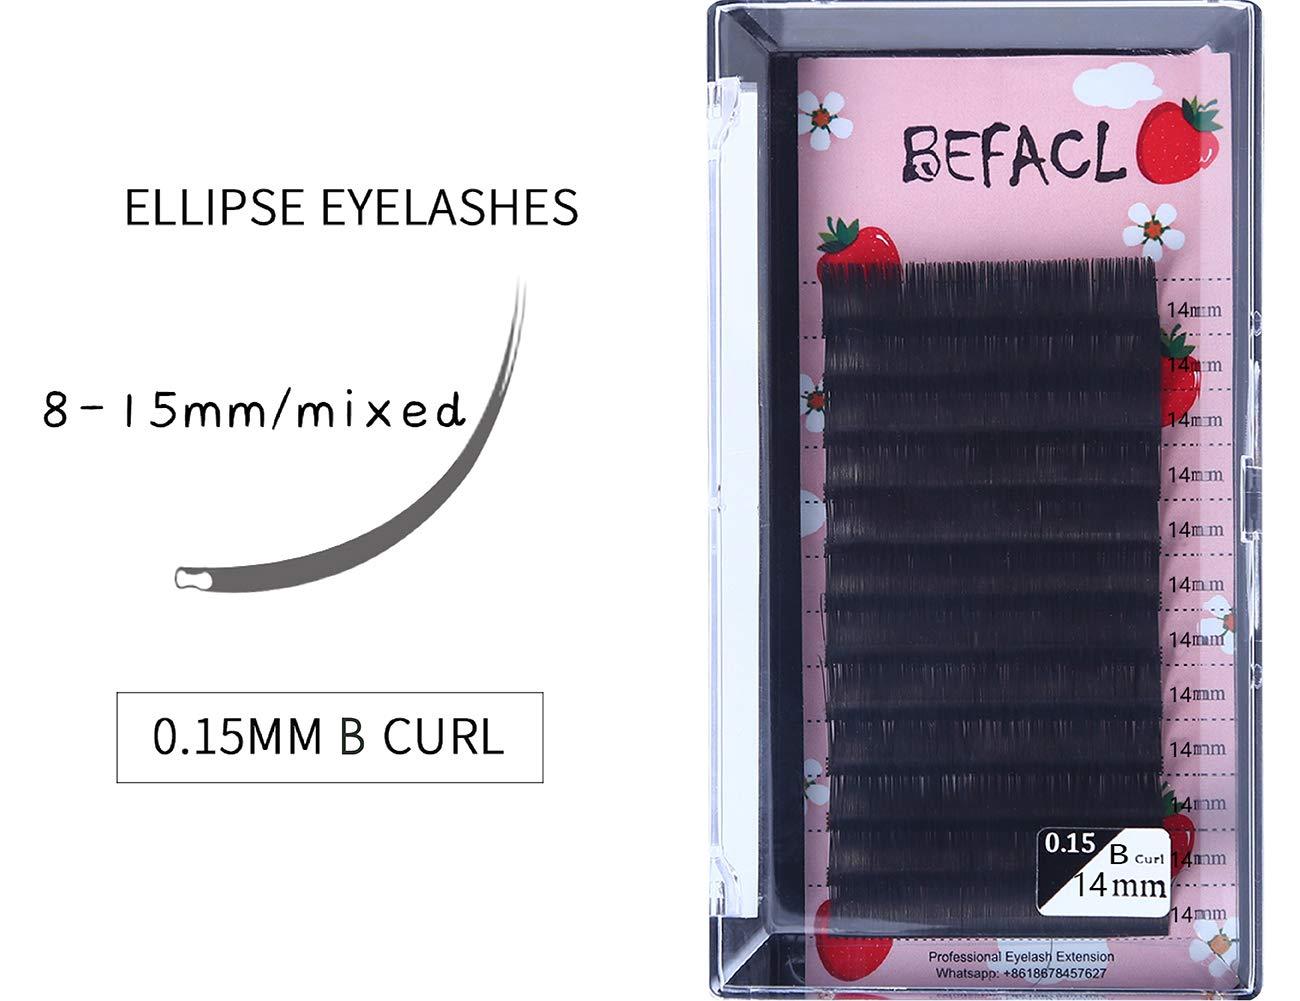 Ellipse Eyelash Extensions 0.15mm B Curl 8-21mm Mixed Flat Eyelash Extension supplies Matte Individual Eyelashes Salon Use Mink Lashes Extensions